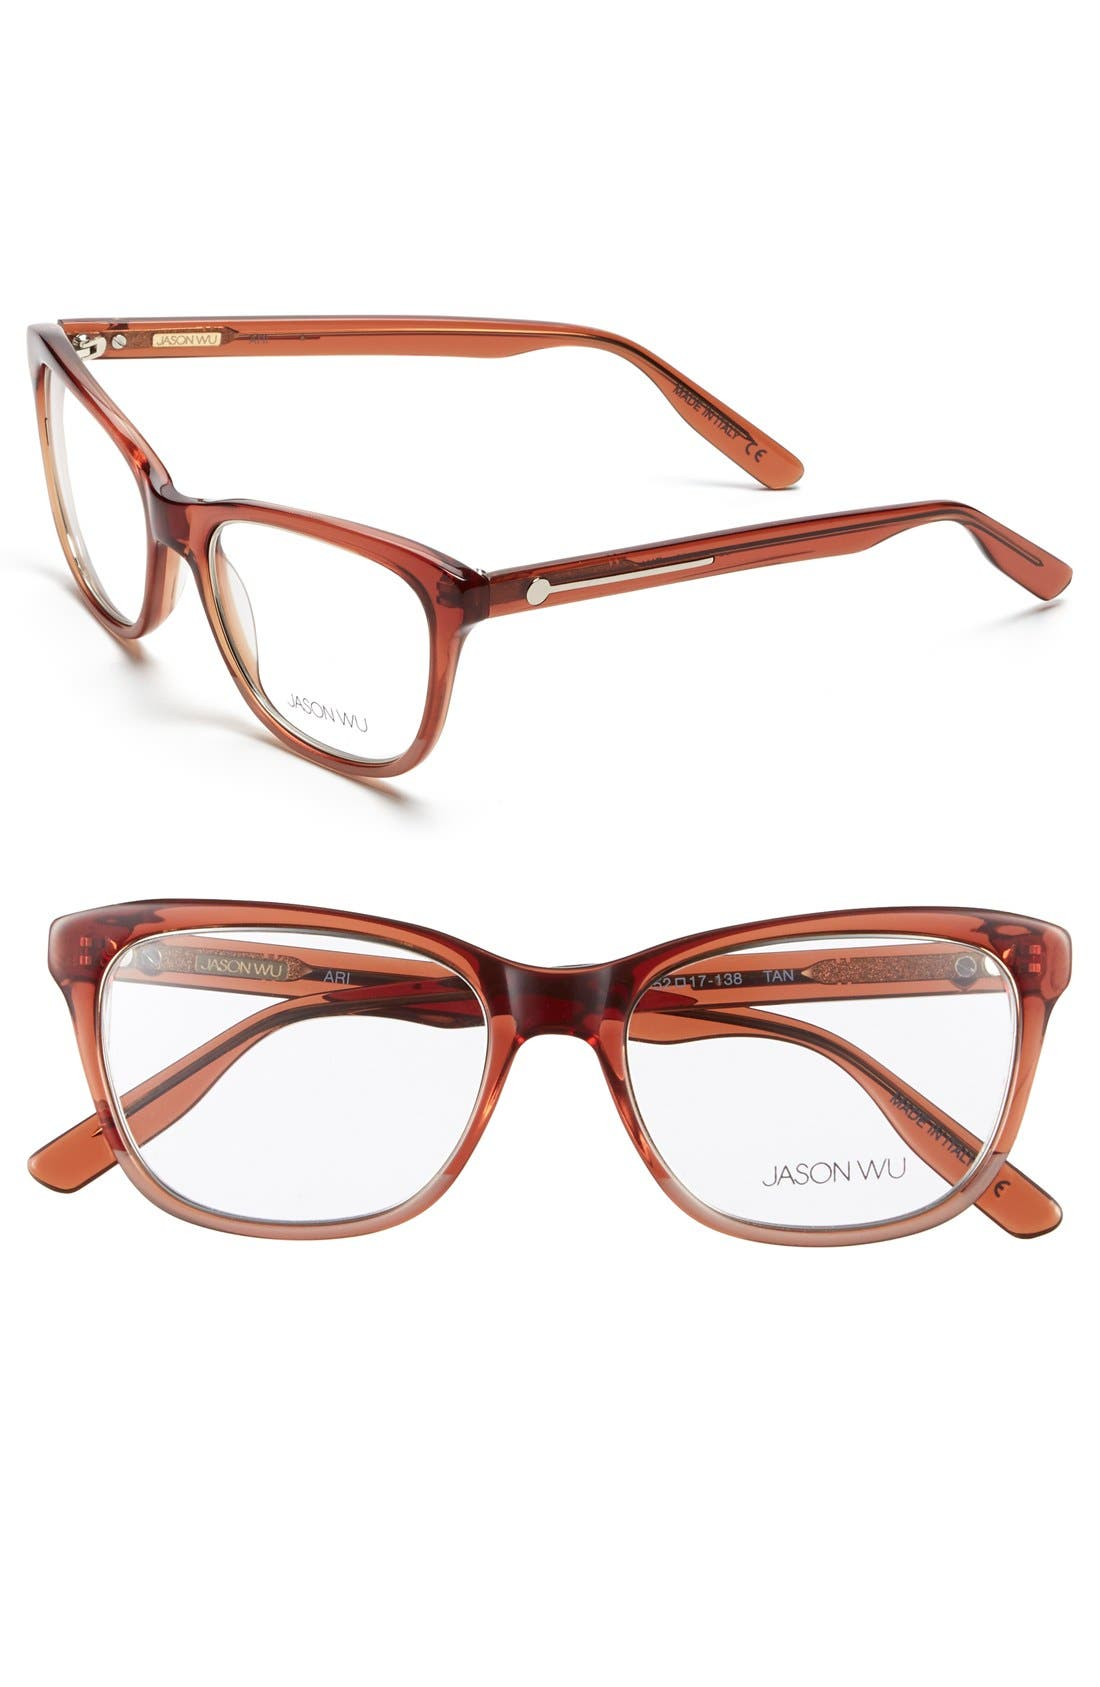 Alternate Image 1 Selected - Jason Wu 'Ari' 52mm Optical Glasses